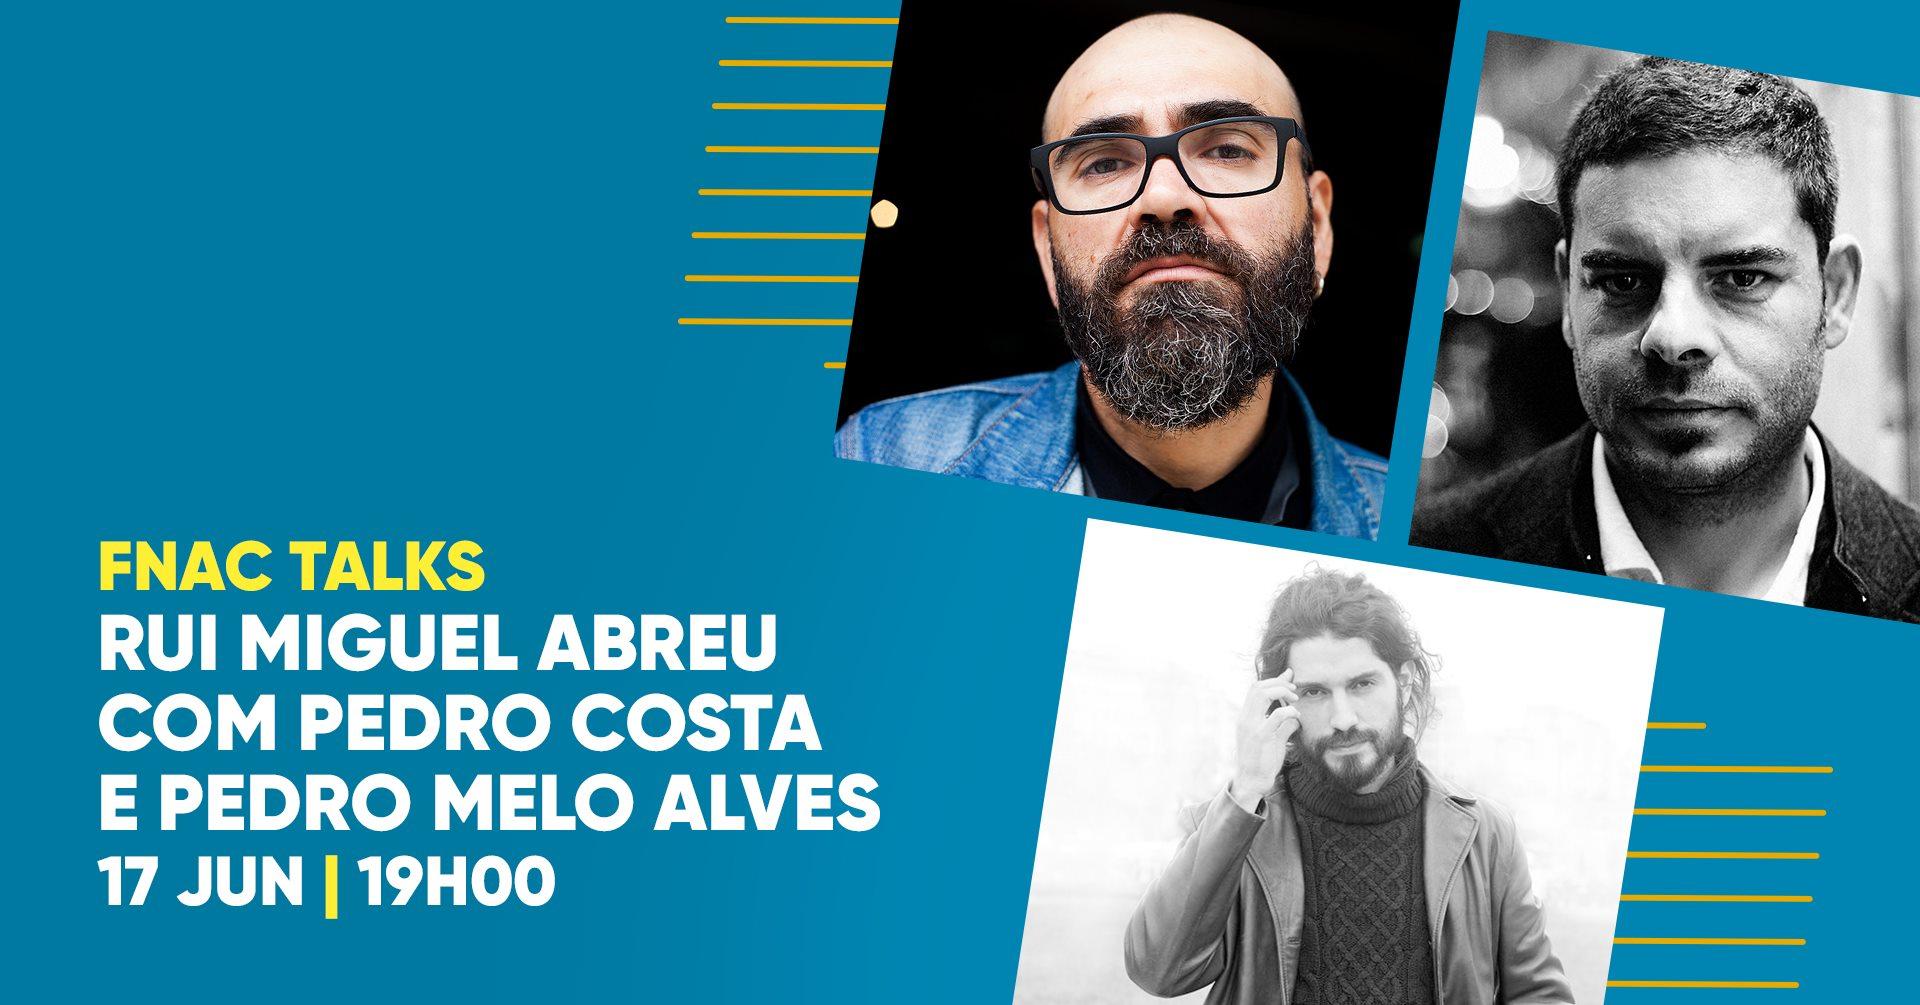 FNAC TALKS | RUI MIGUEL ABREU COM PEDRO COSTA E PEDRO MELO ALVES